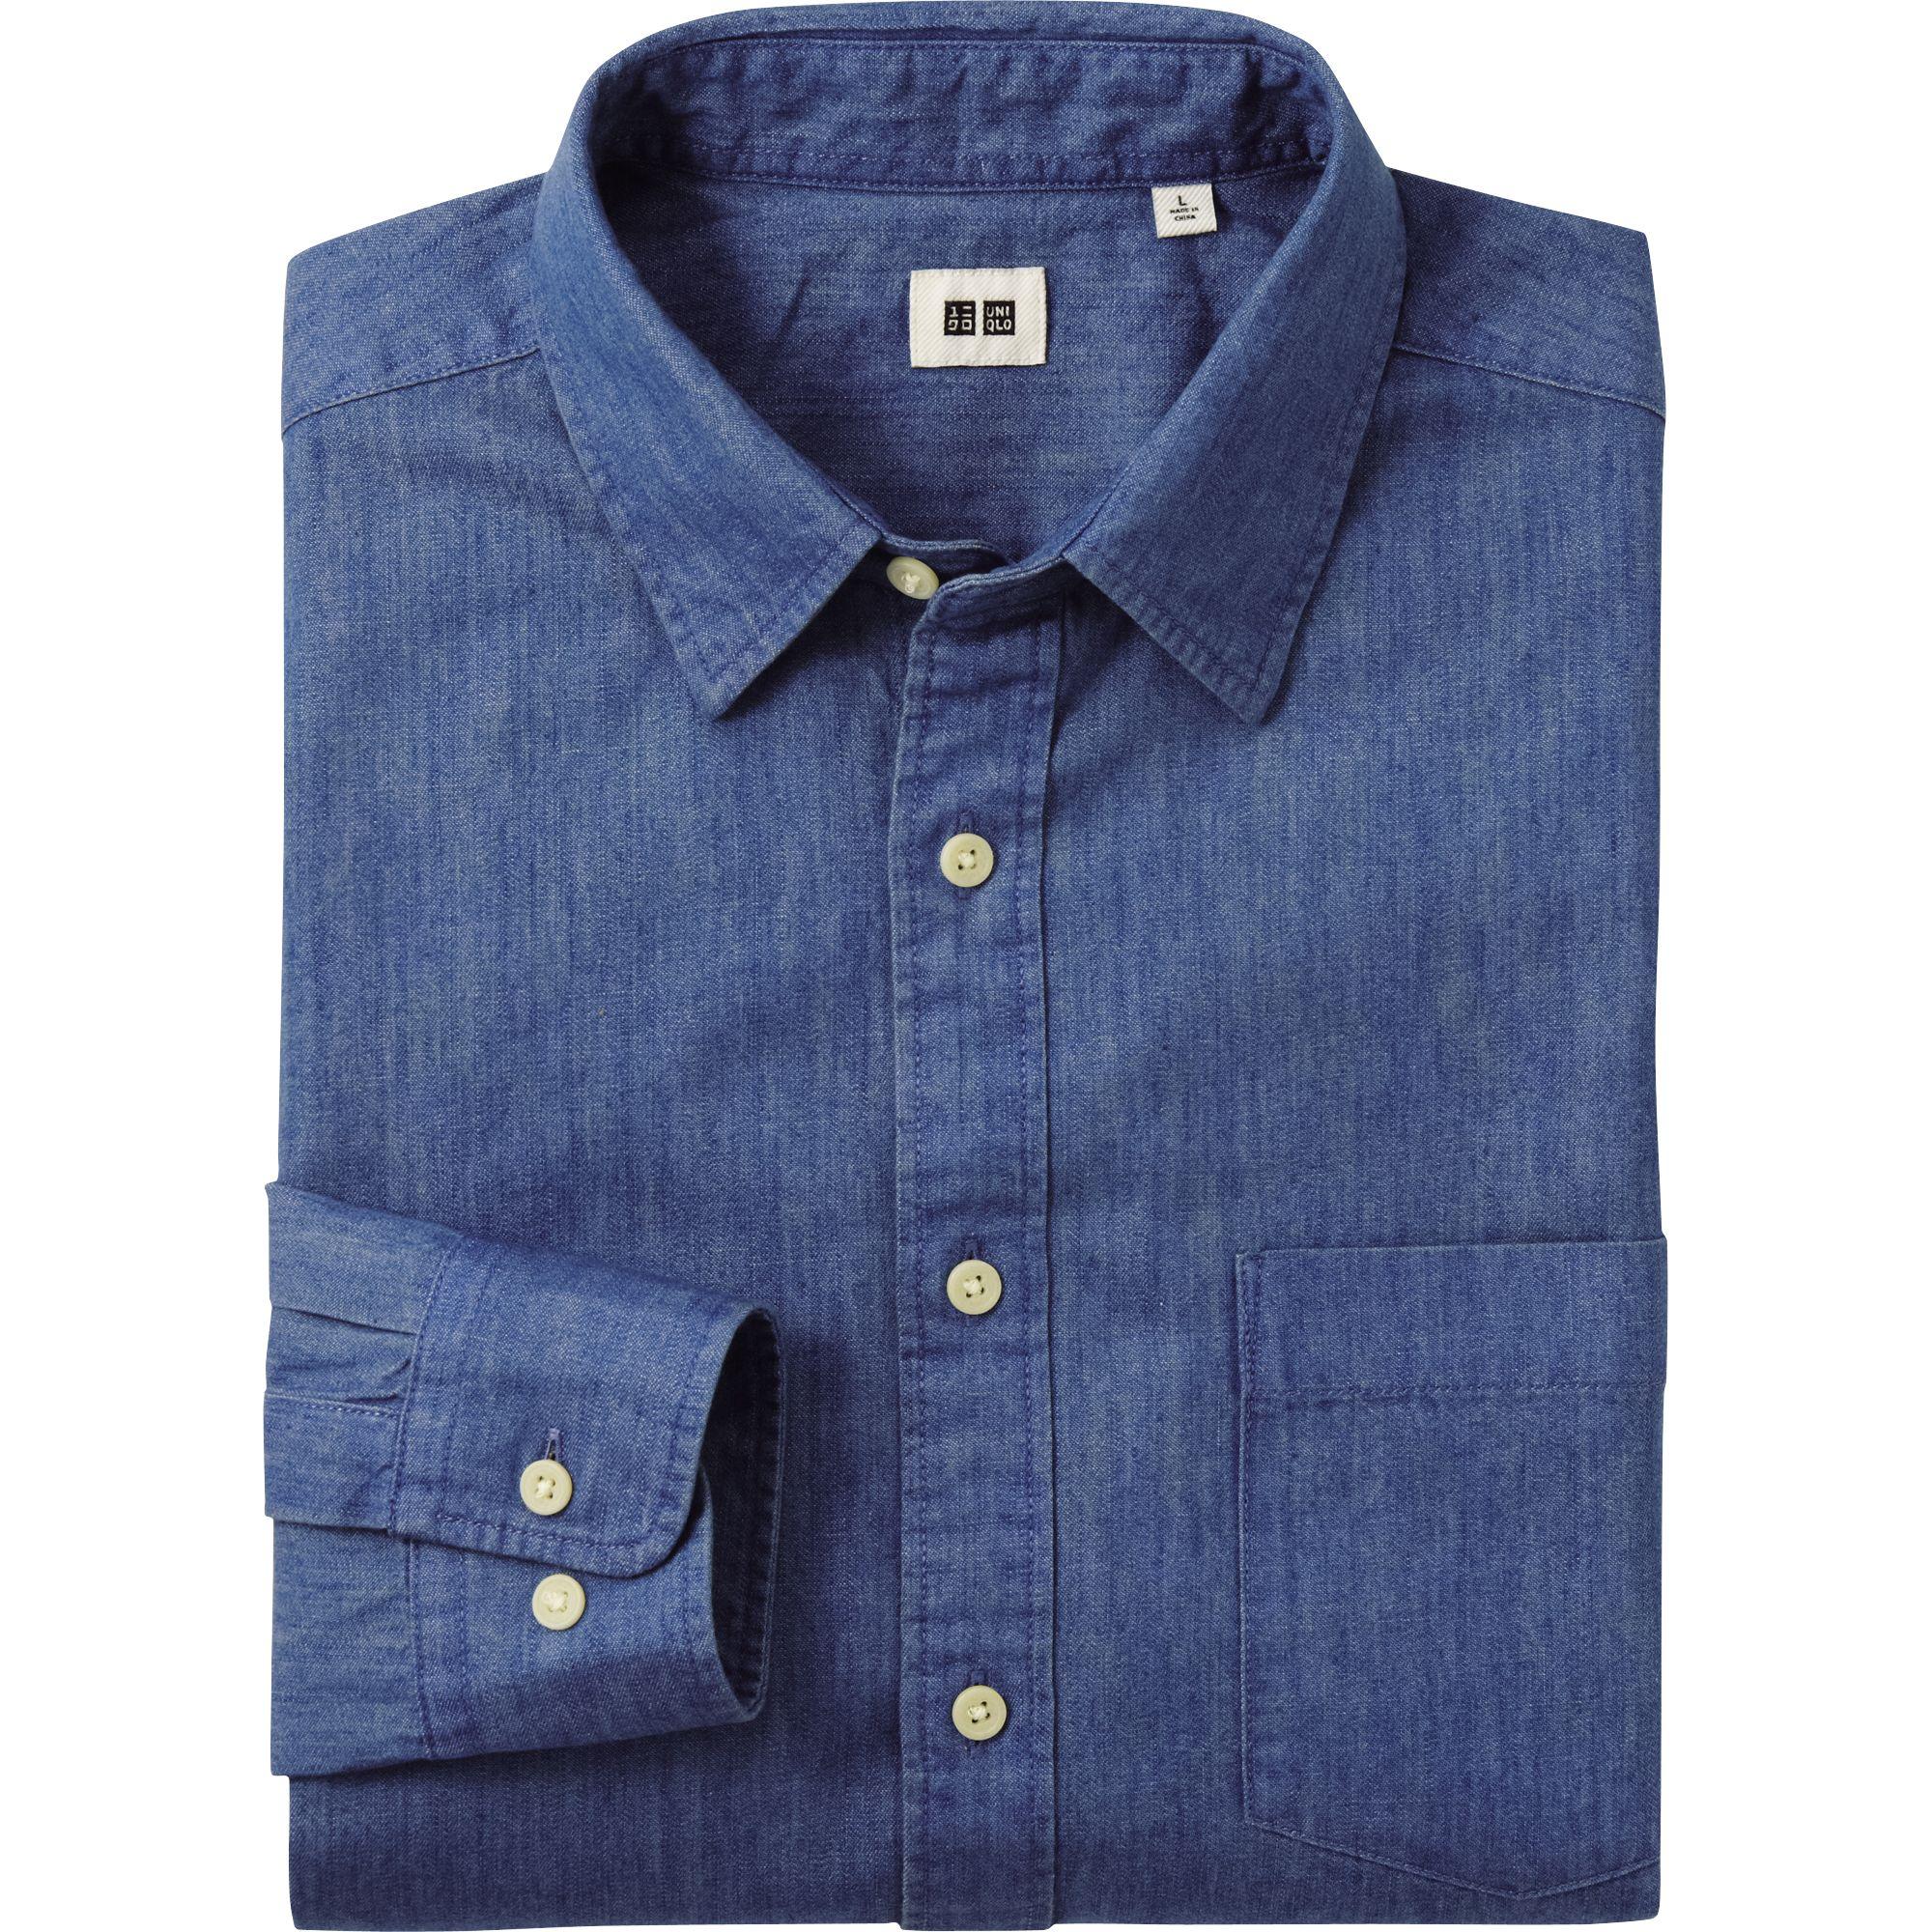 Uniqlo Denim Long Sleeve Shirt In Blue For Men Lyst